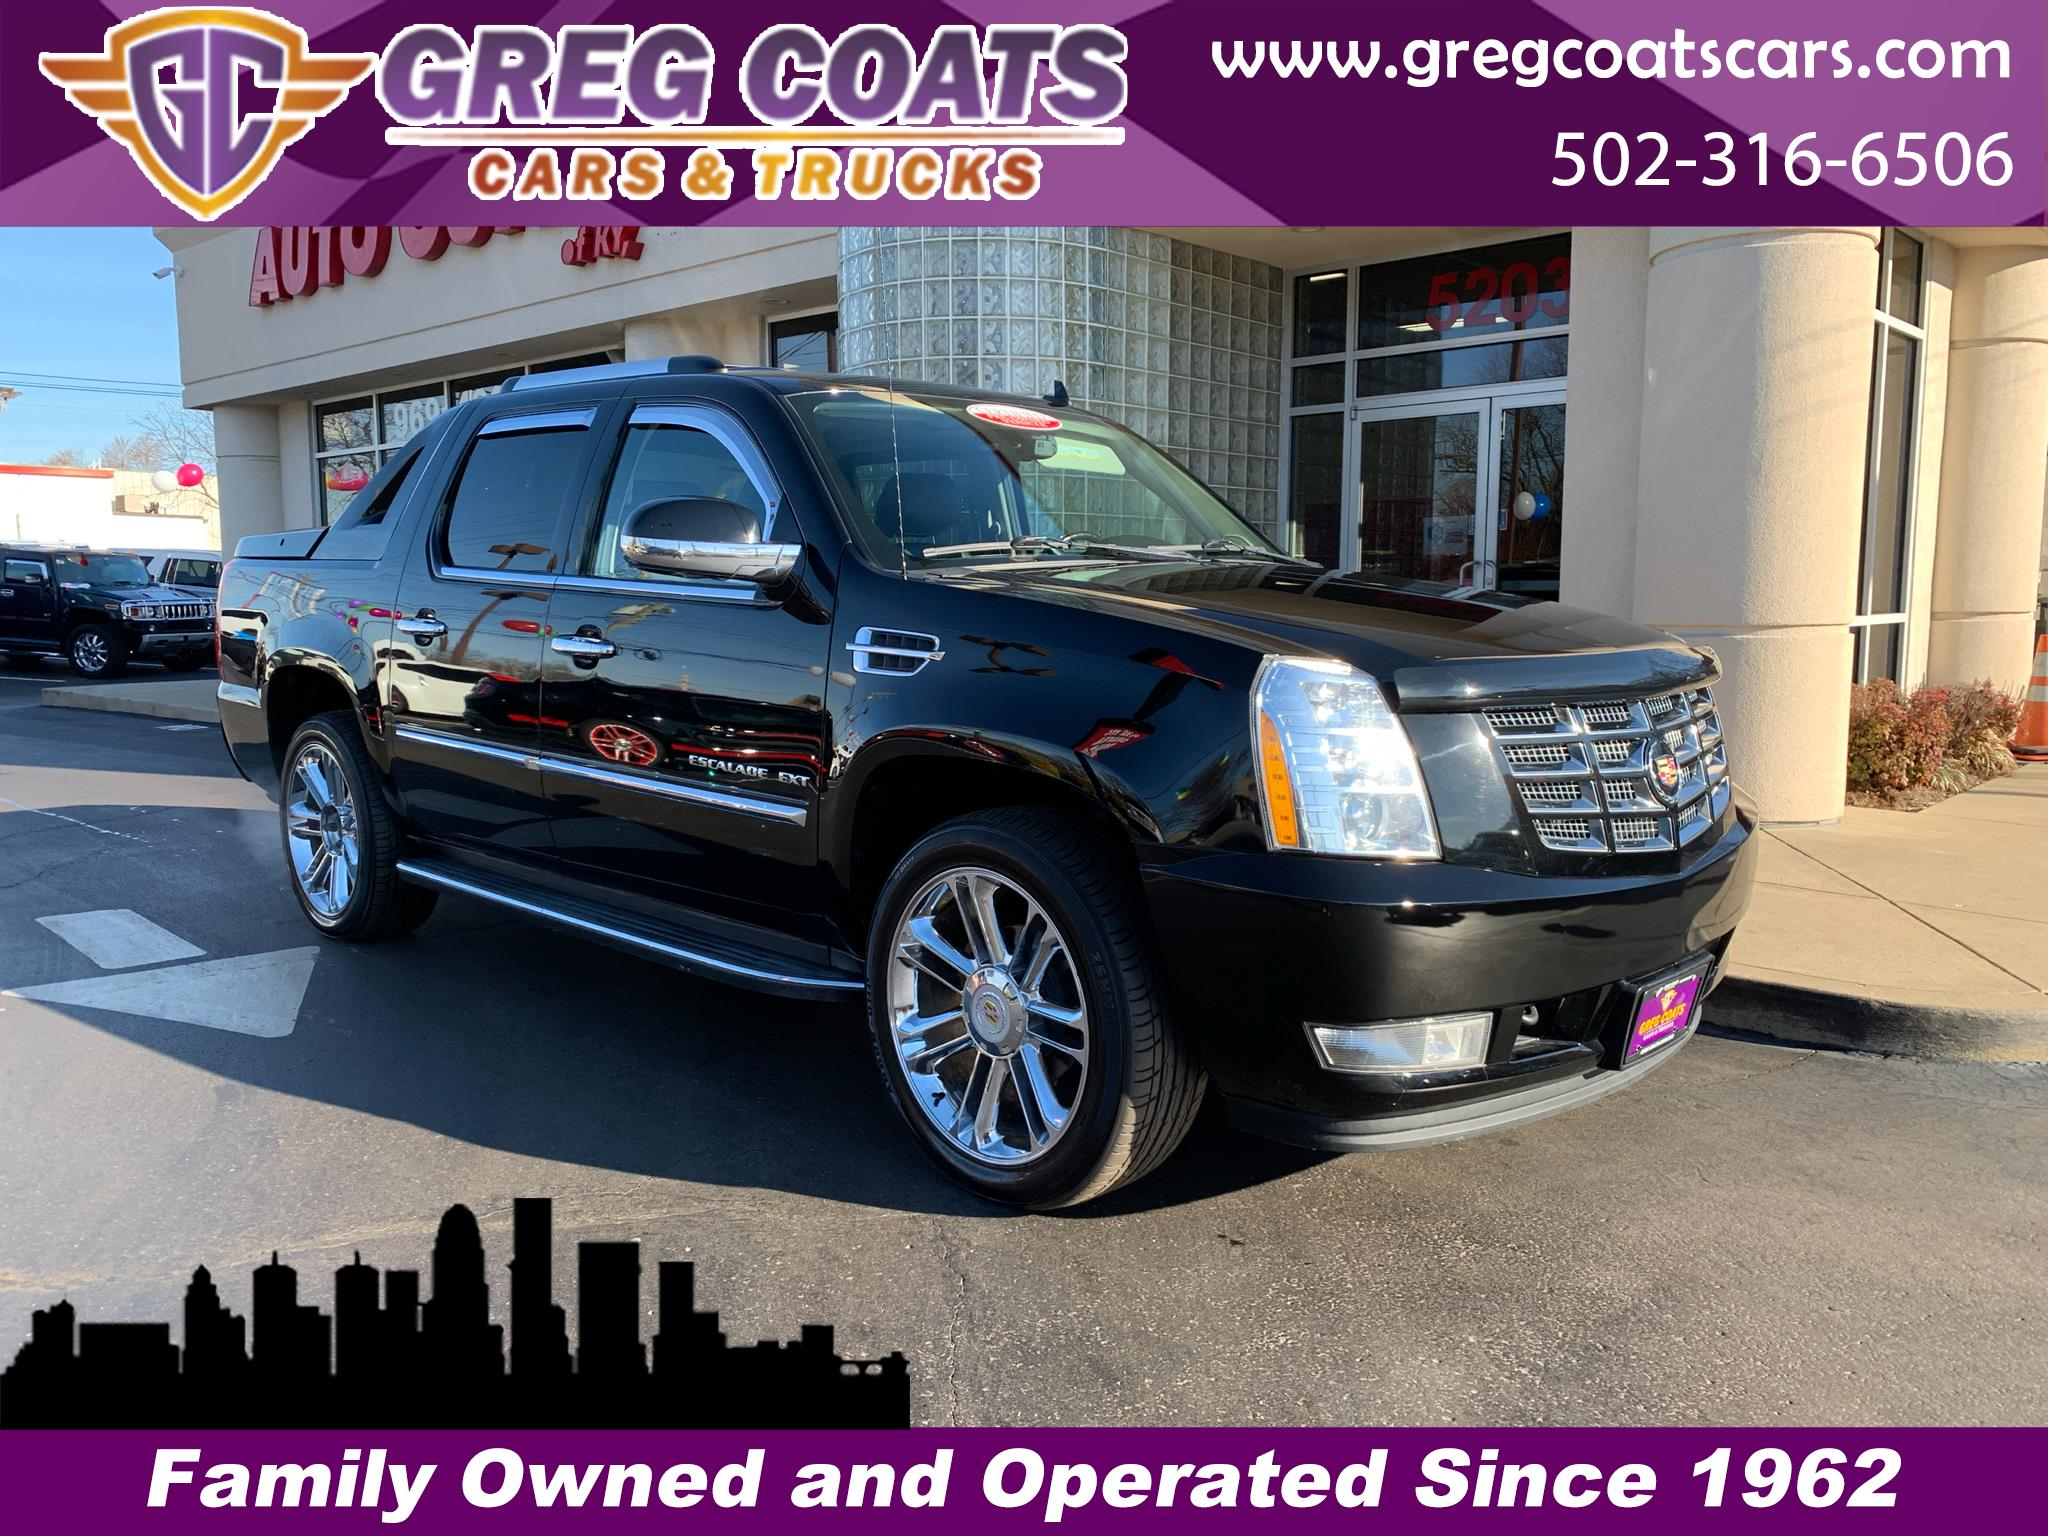 2012 Cadillac Escalade EXT Luxury